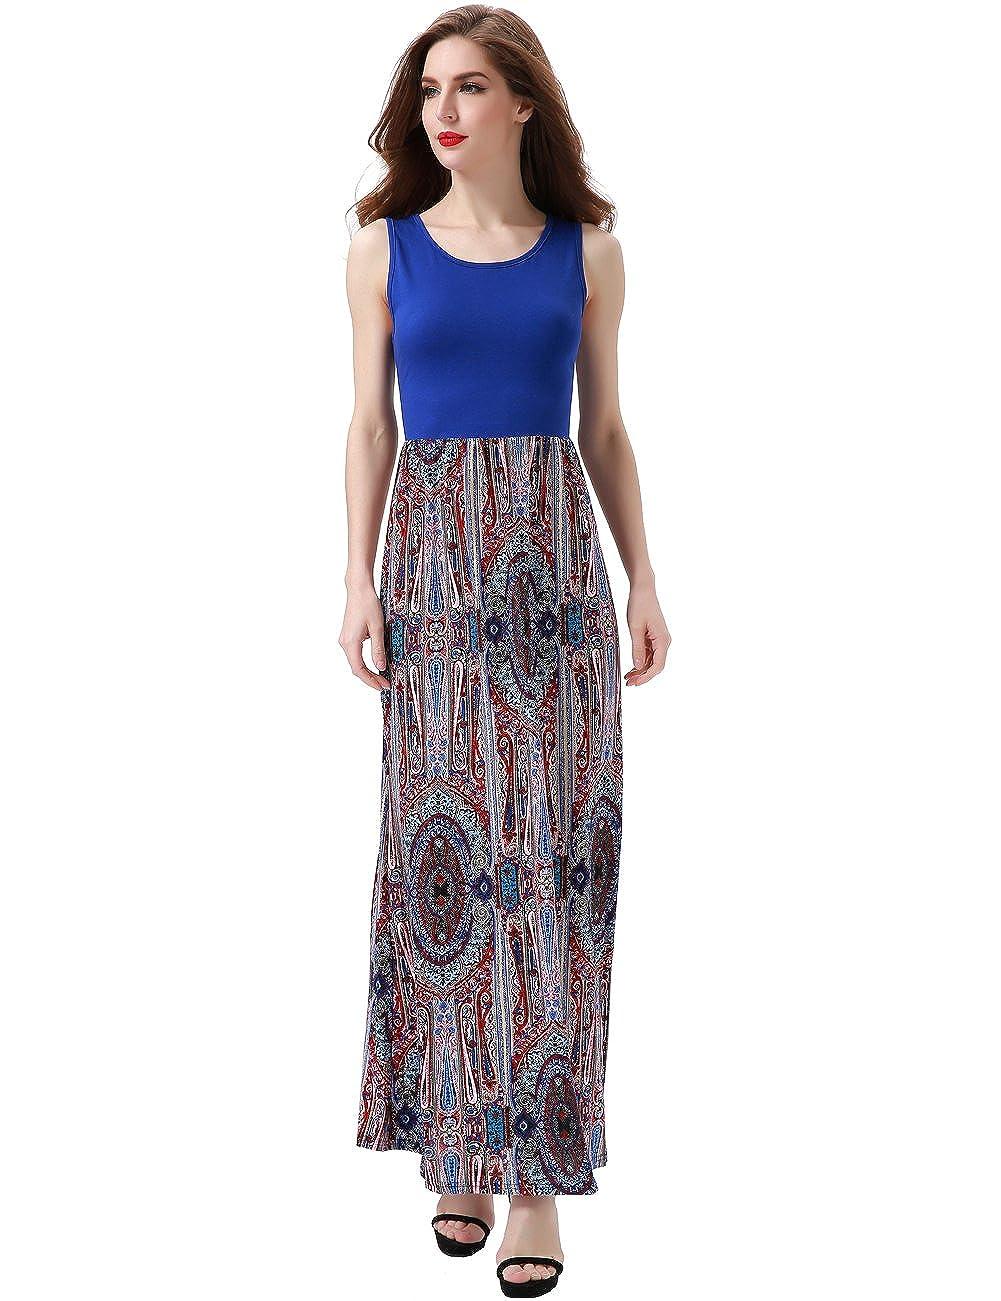 08b473f803 Maxi Summer Dresses And Skirts